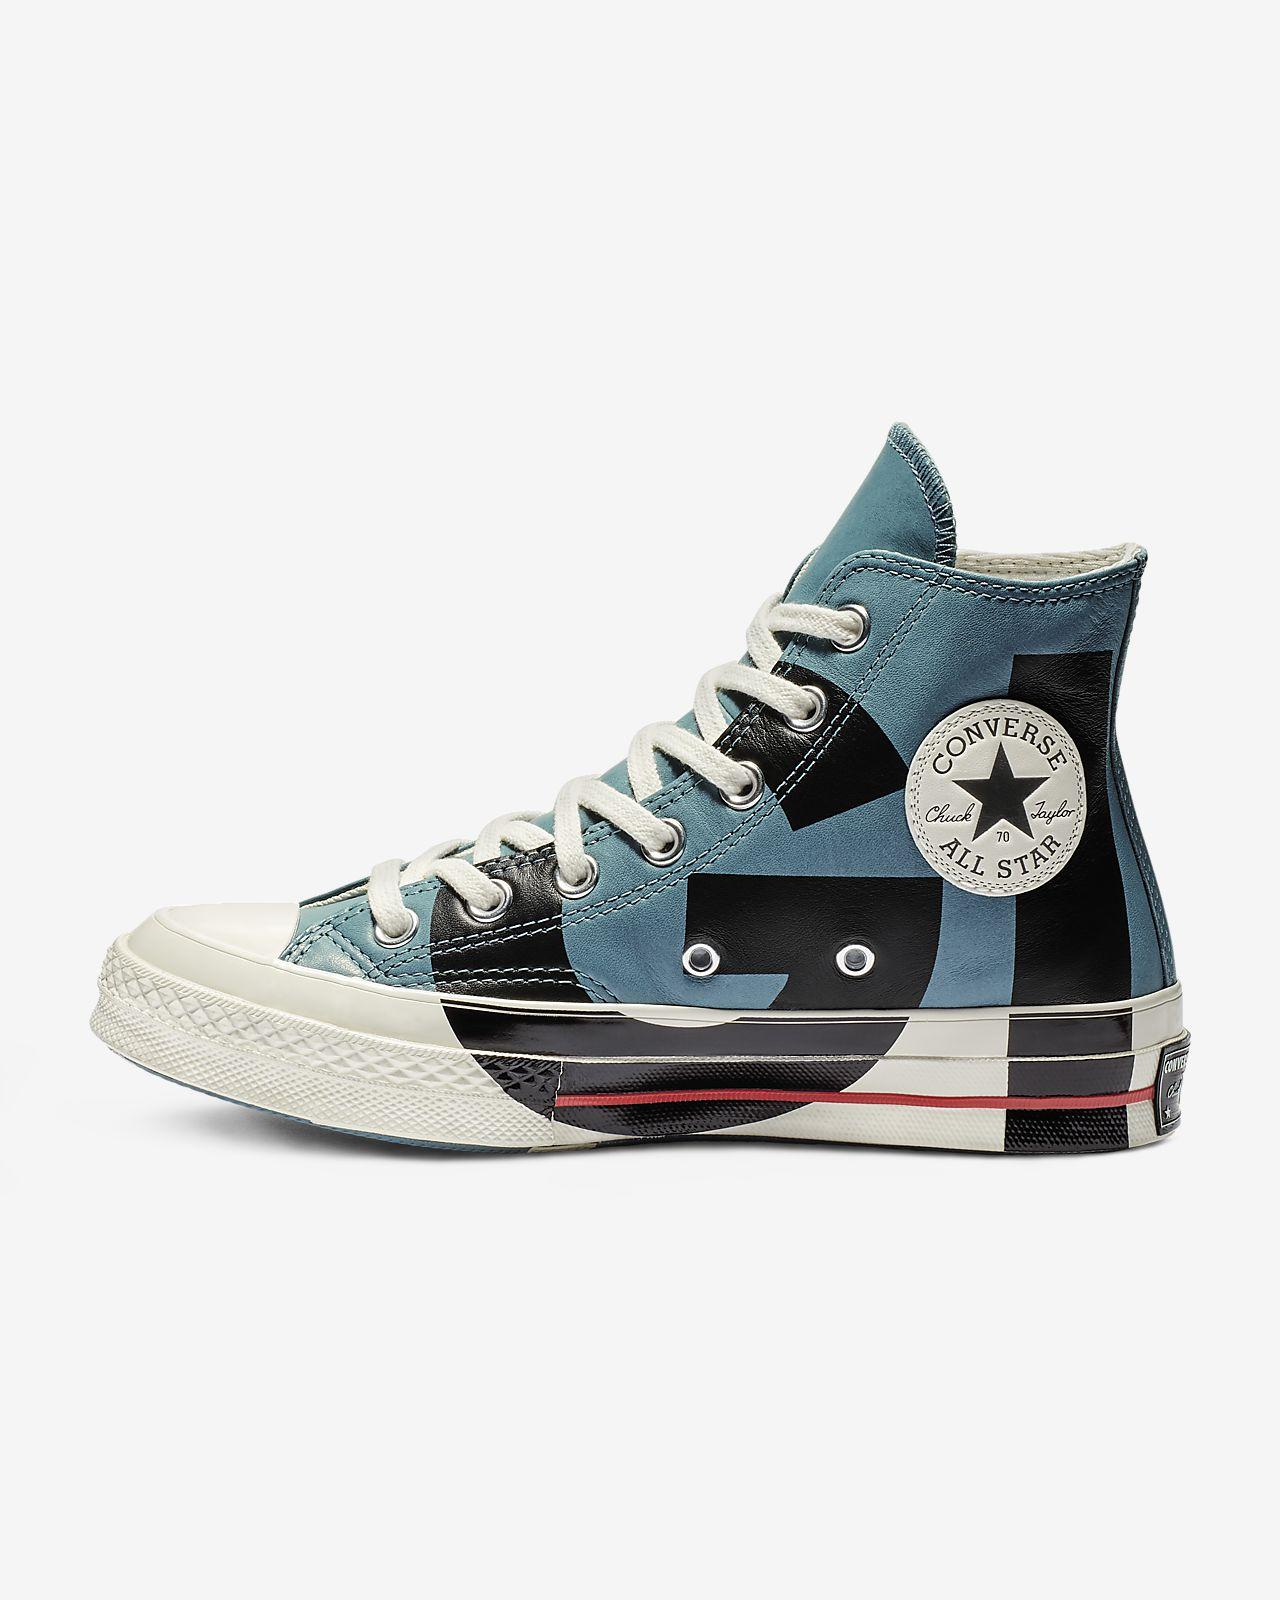 Converse Chuck 70 Love Graphic High Top Women's Shoe